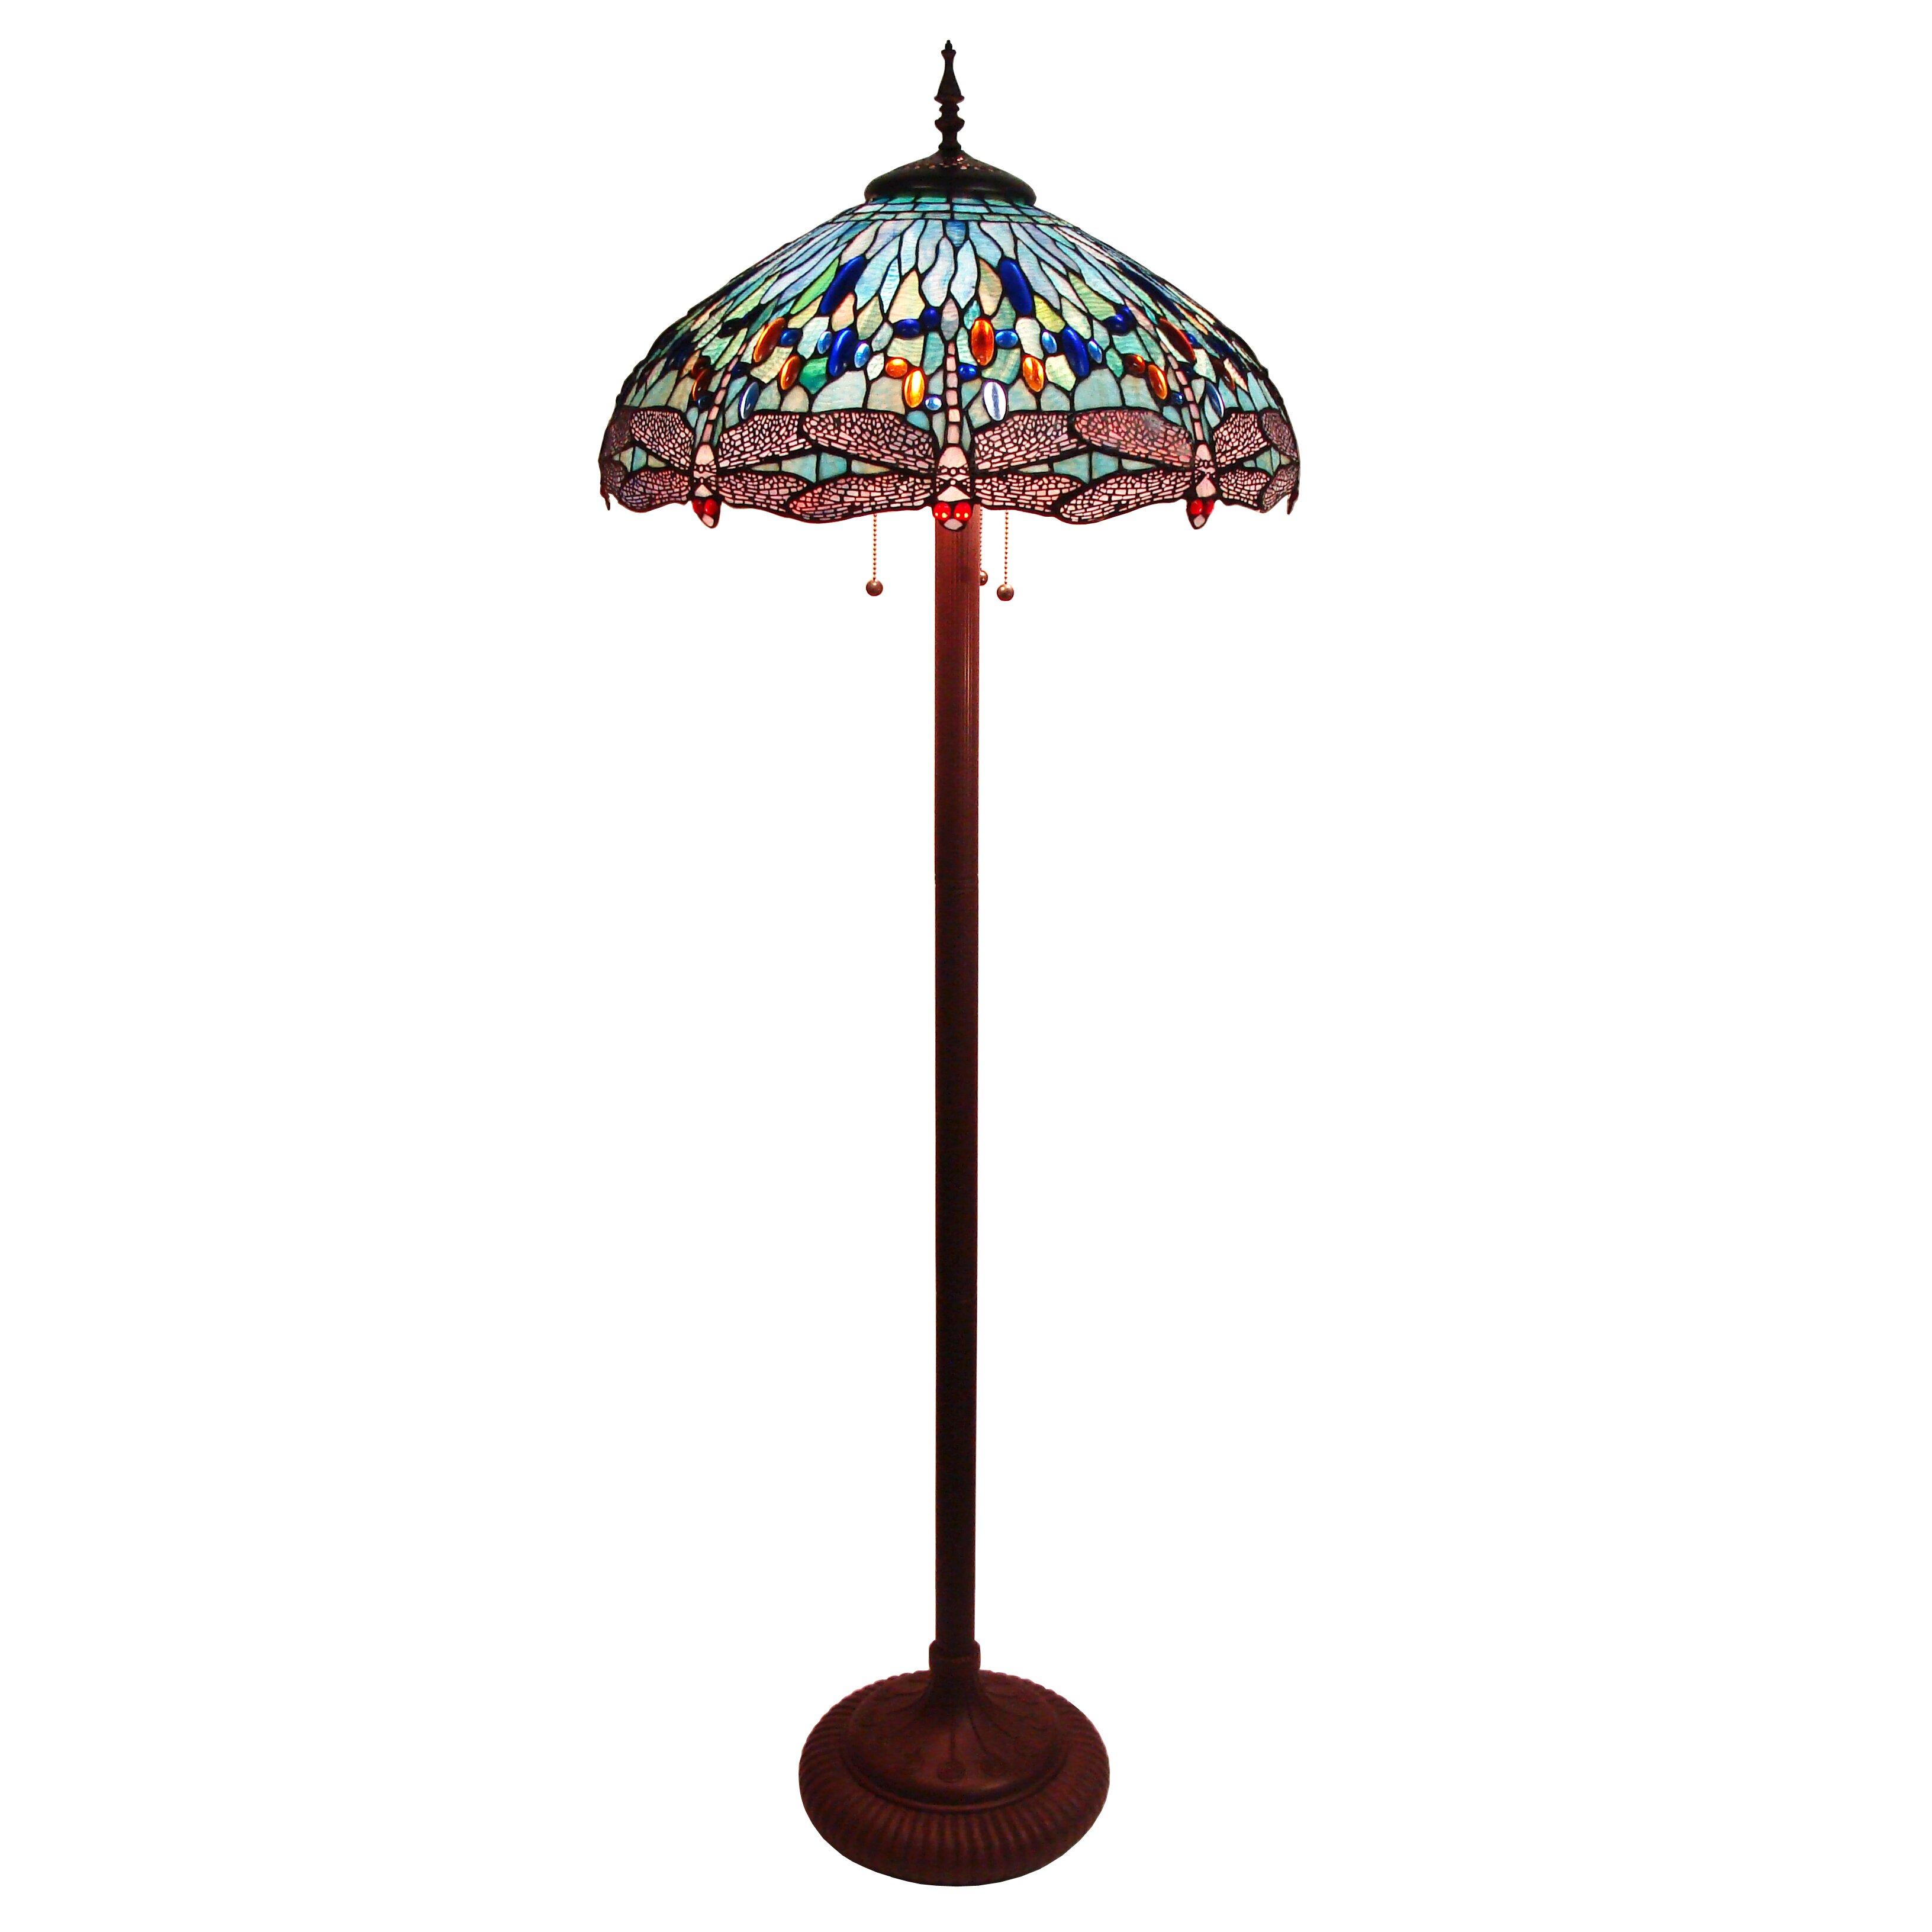 fine art lighting tiffany dragonfly 65 floor lamp reviews wayfair. Black Bedroom Furniture Sets. Home Design Ideas